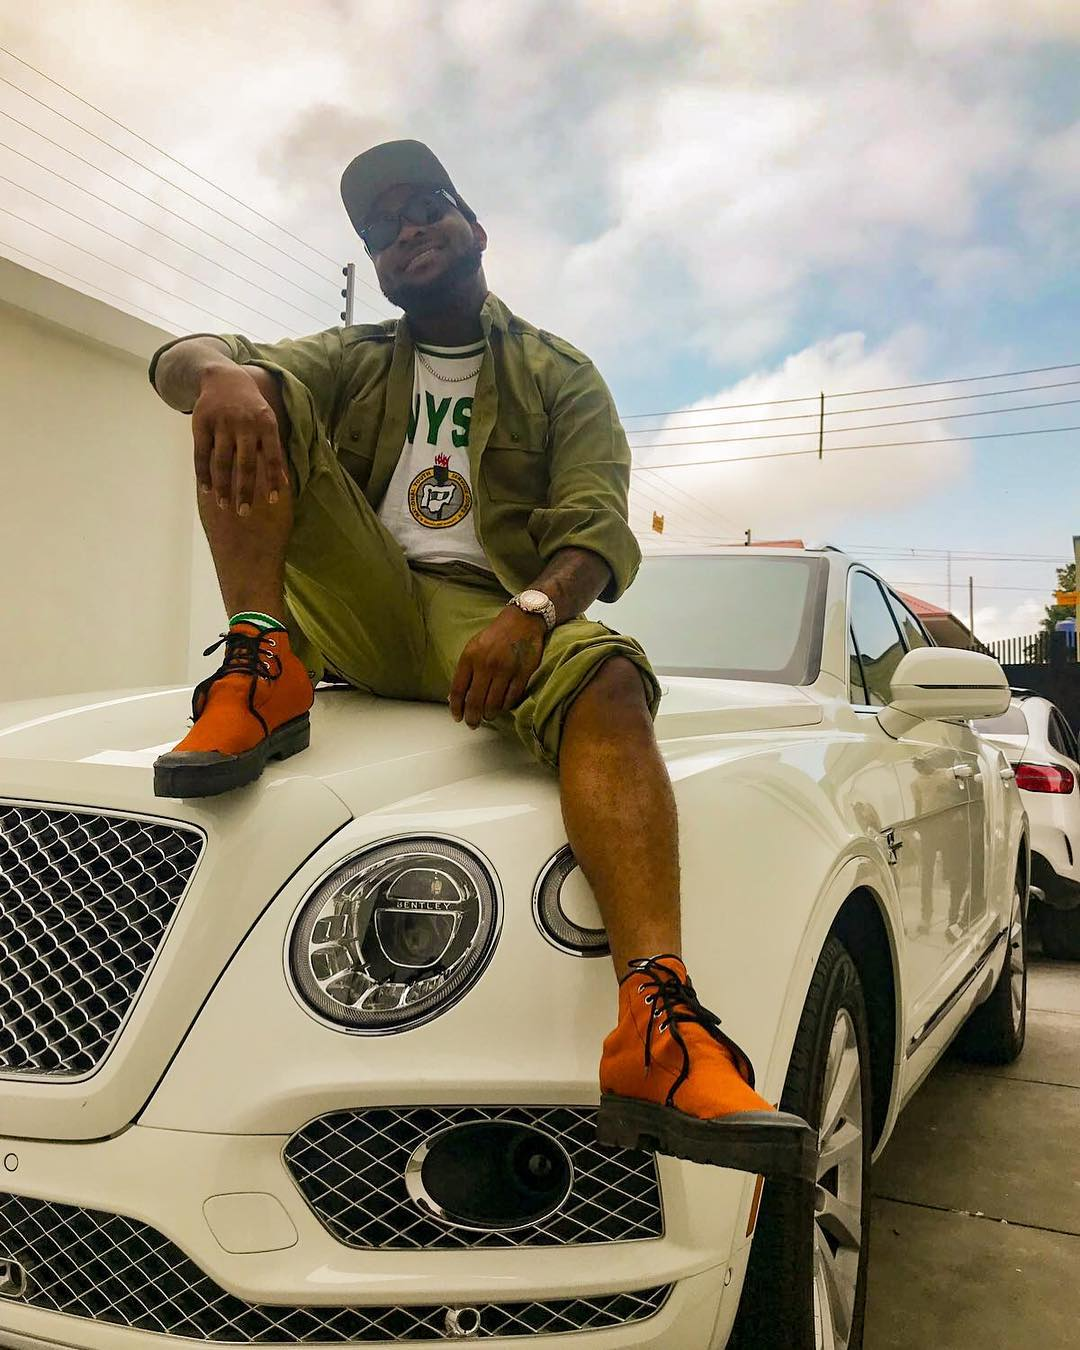 Davido Wearing NYSC Uniform And Sitting On Bentley